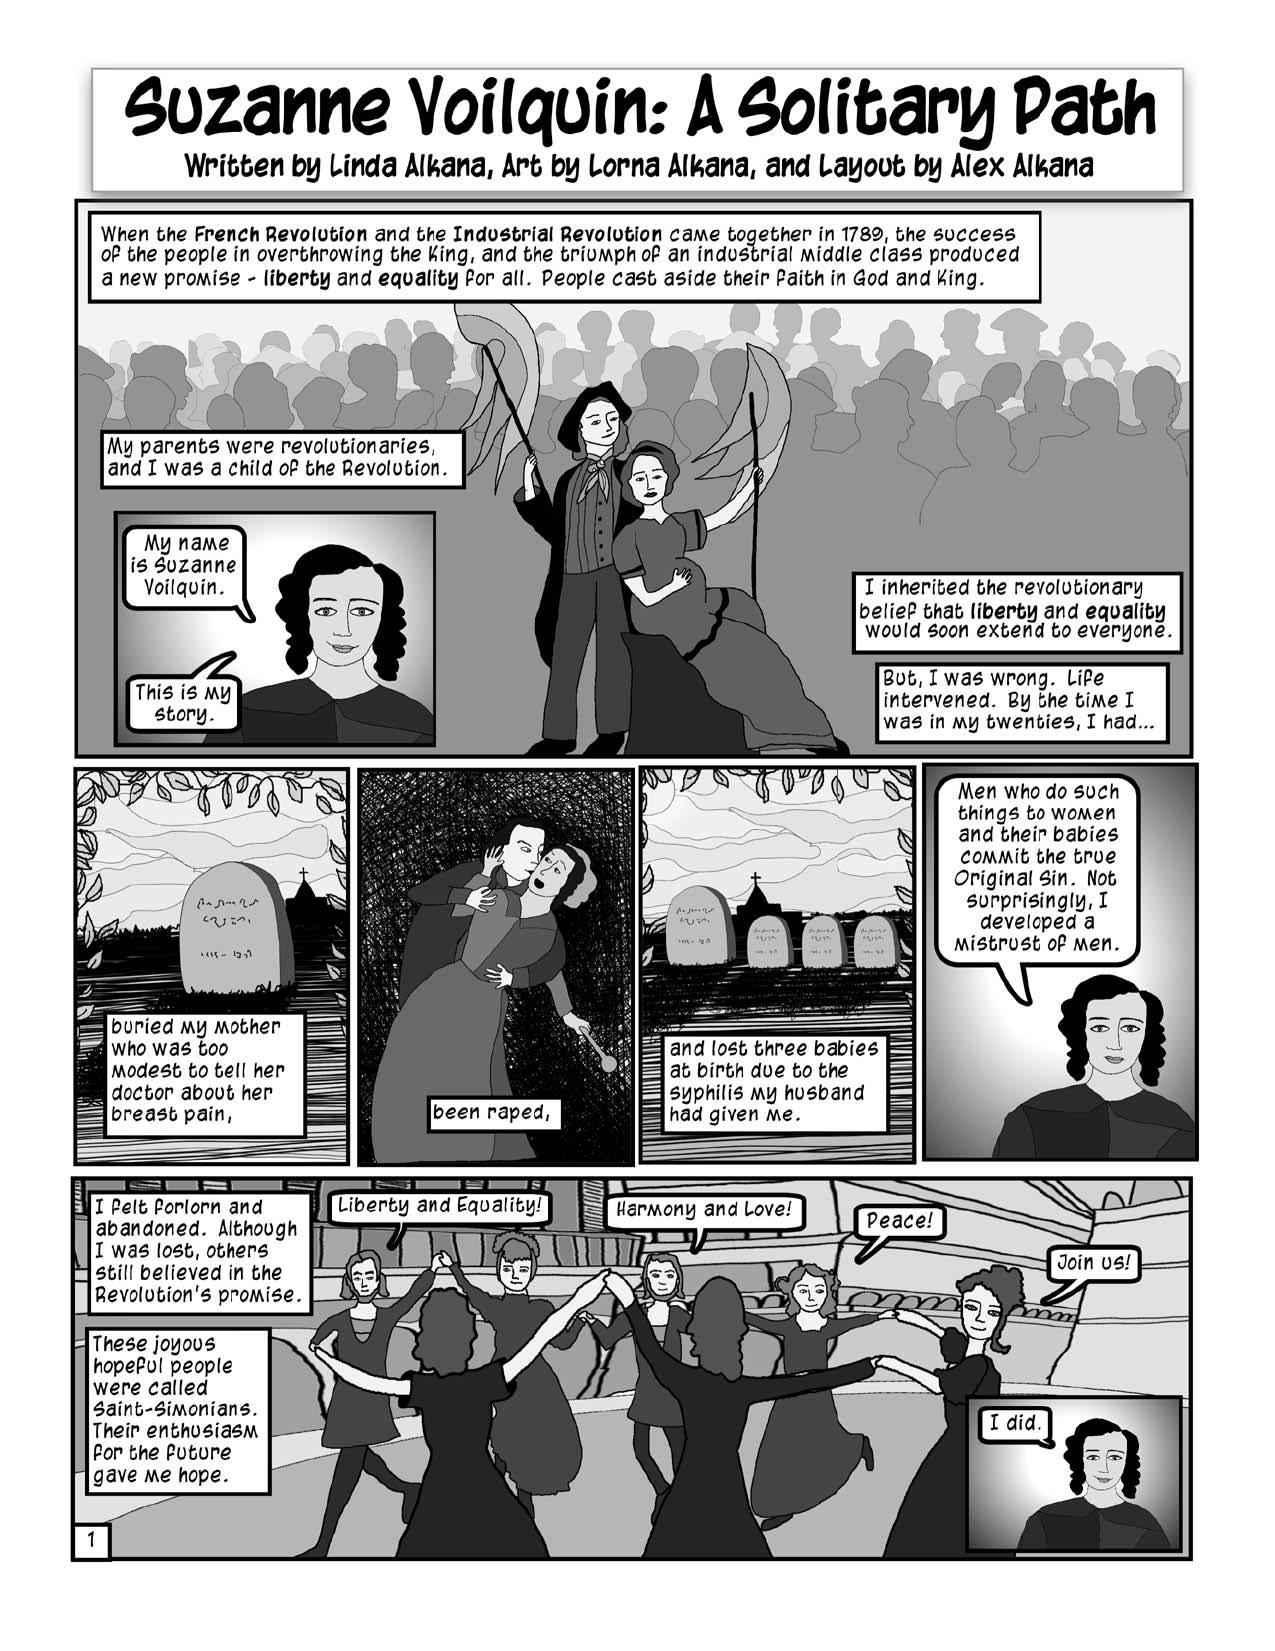 Project #3: Suzanne Voilquin Socialist Feminist